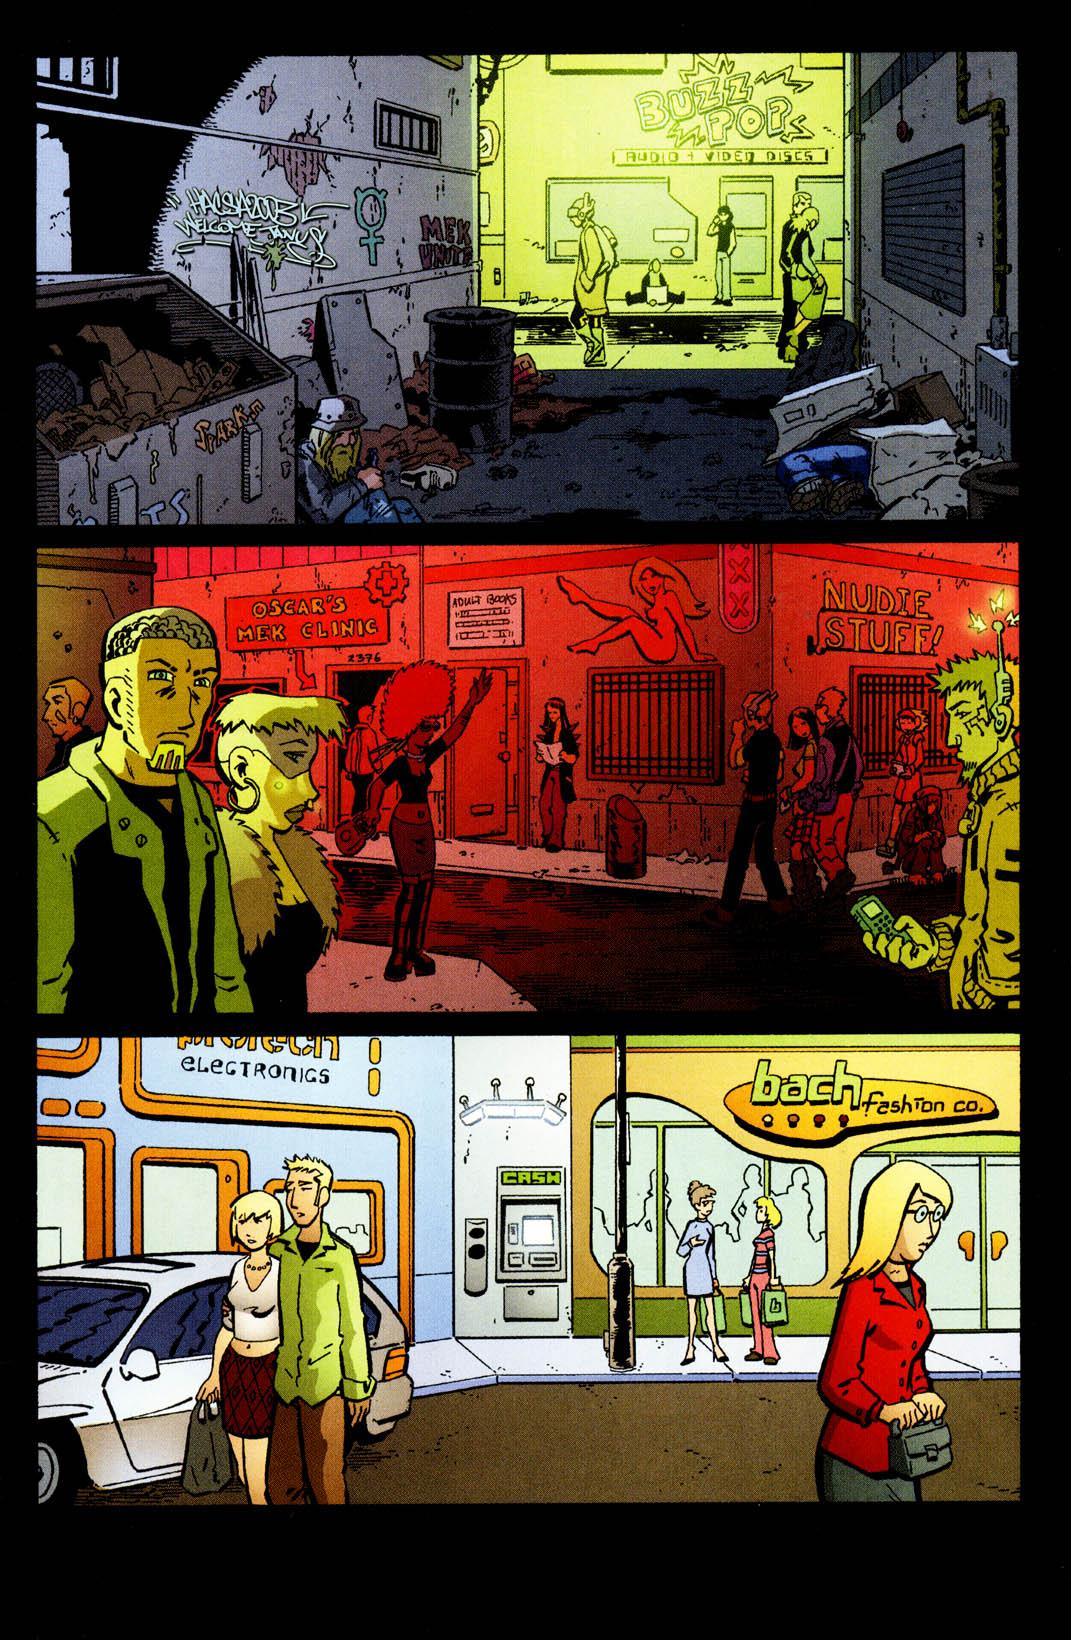 Read online Mek comic -  Issue #2 - 3